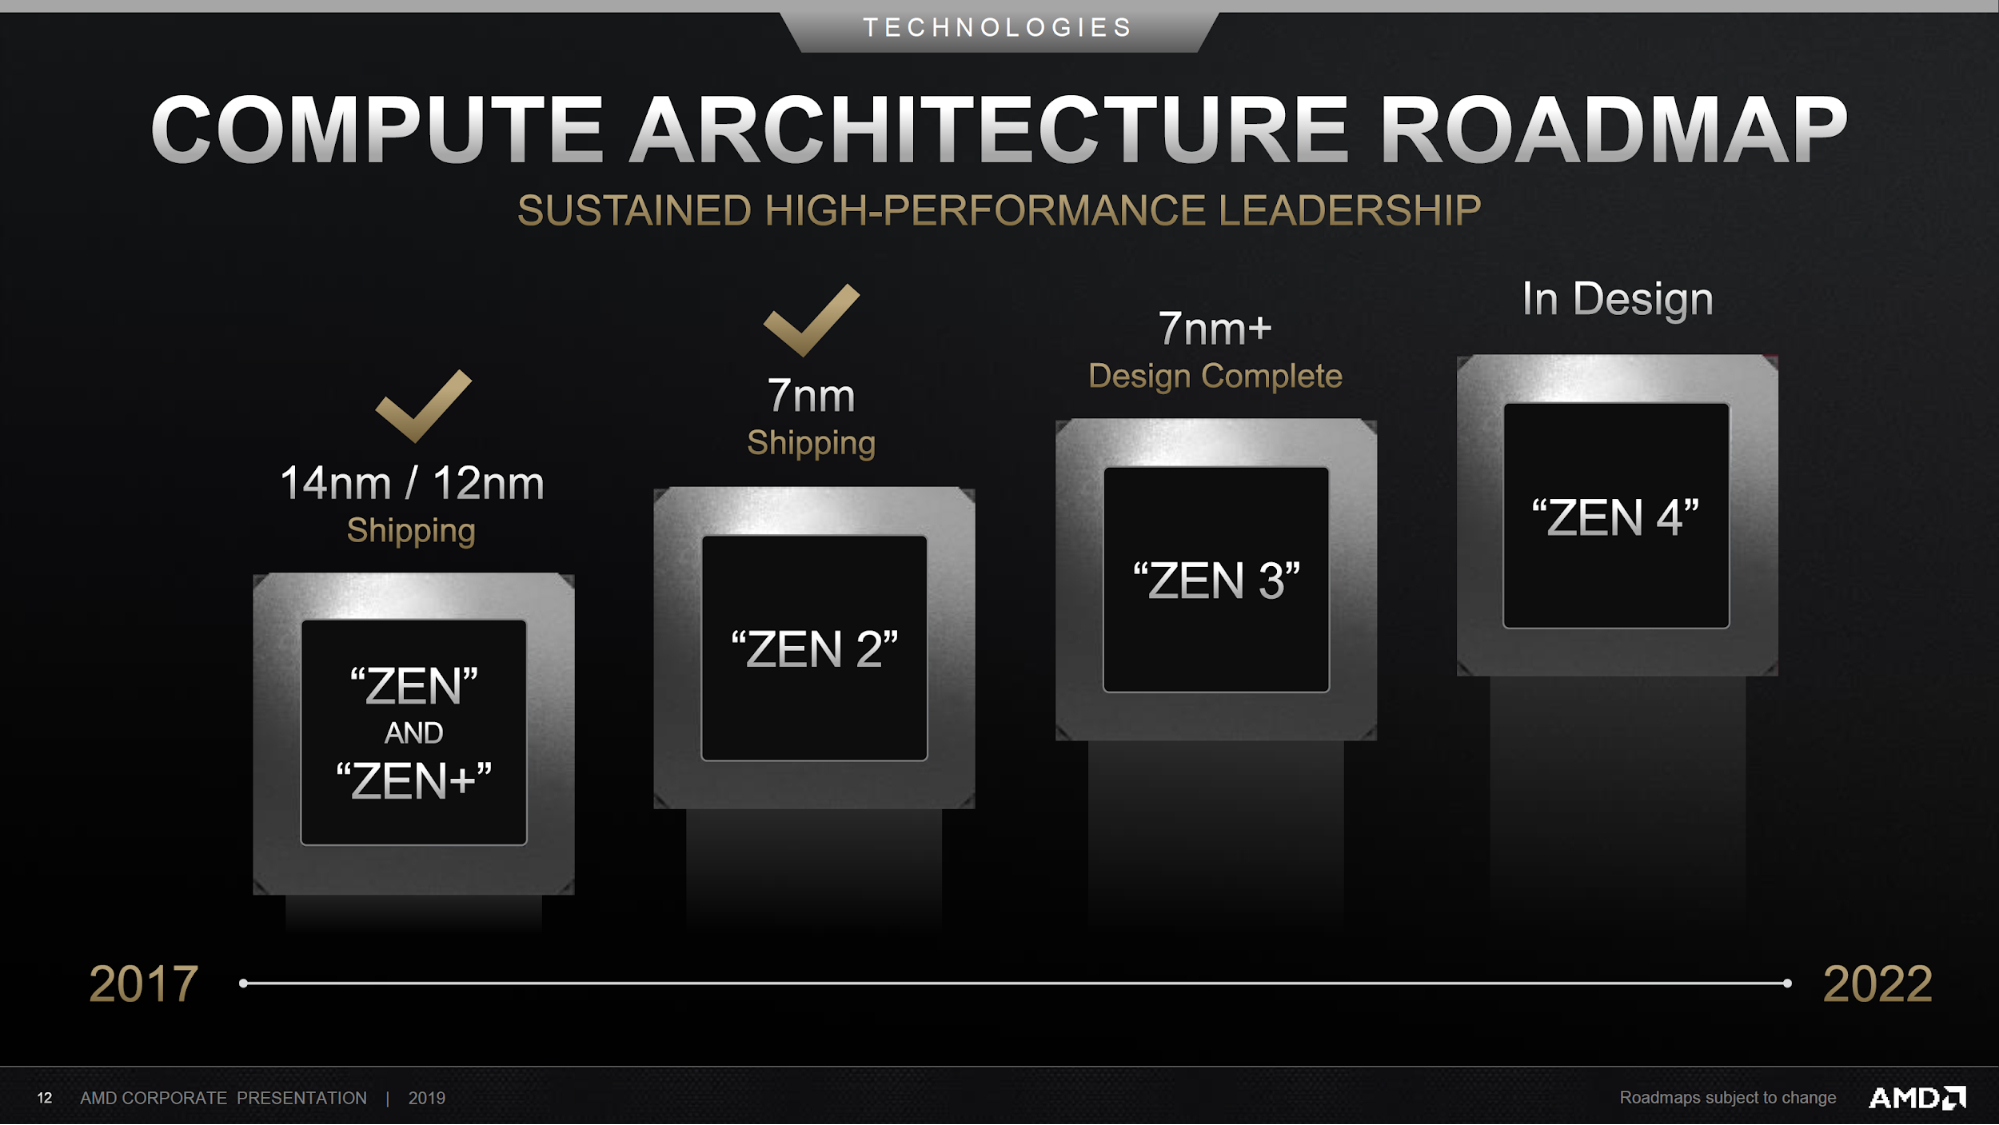 照片中提到了TECHNOLOGIES、COMPUTE ARCHITECTURE ROADMAP、SUSTAINED HIGH-PERFORMANCE LEADERSHIP,跟塞曼有關,包含了禪宗3、py、Advanced Micro Devices公司、禪、中央處理器